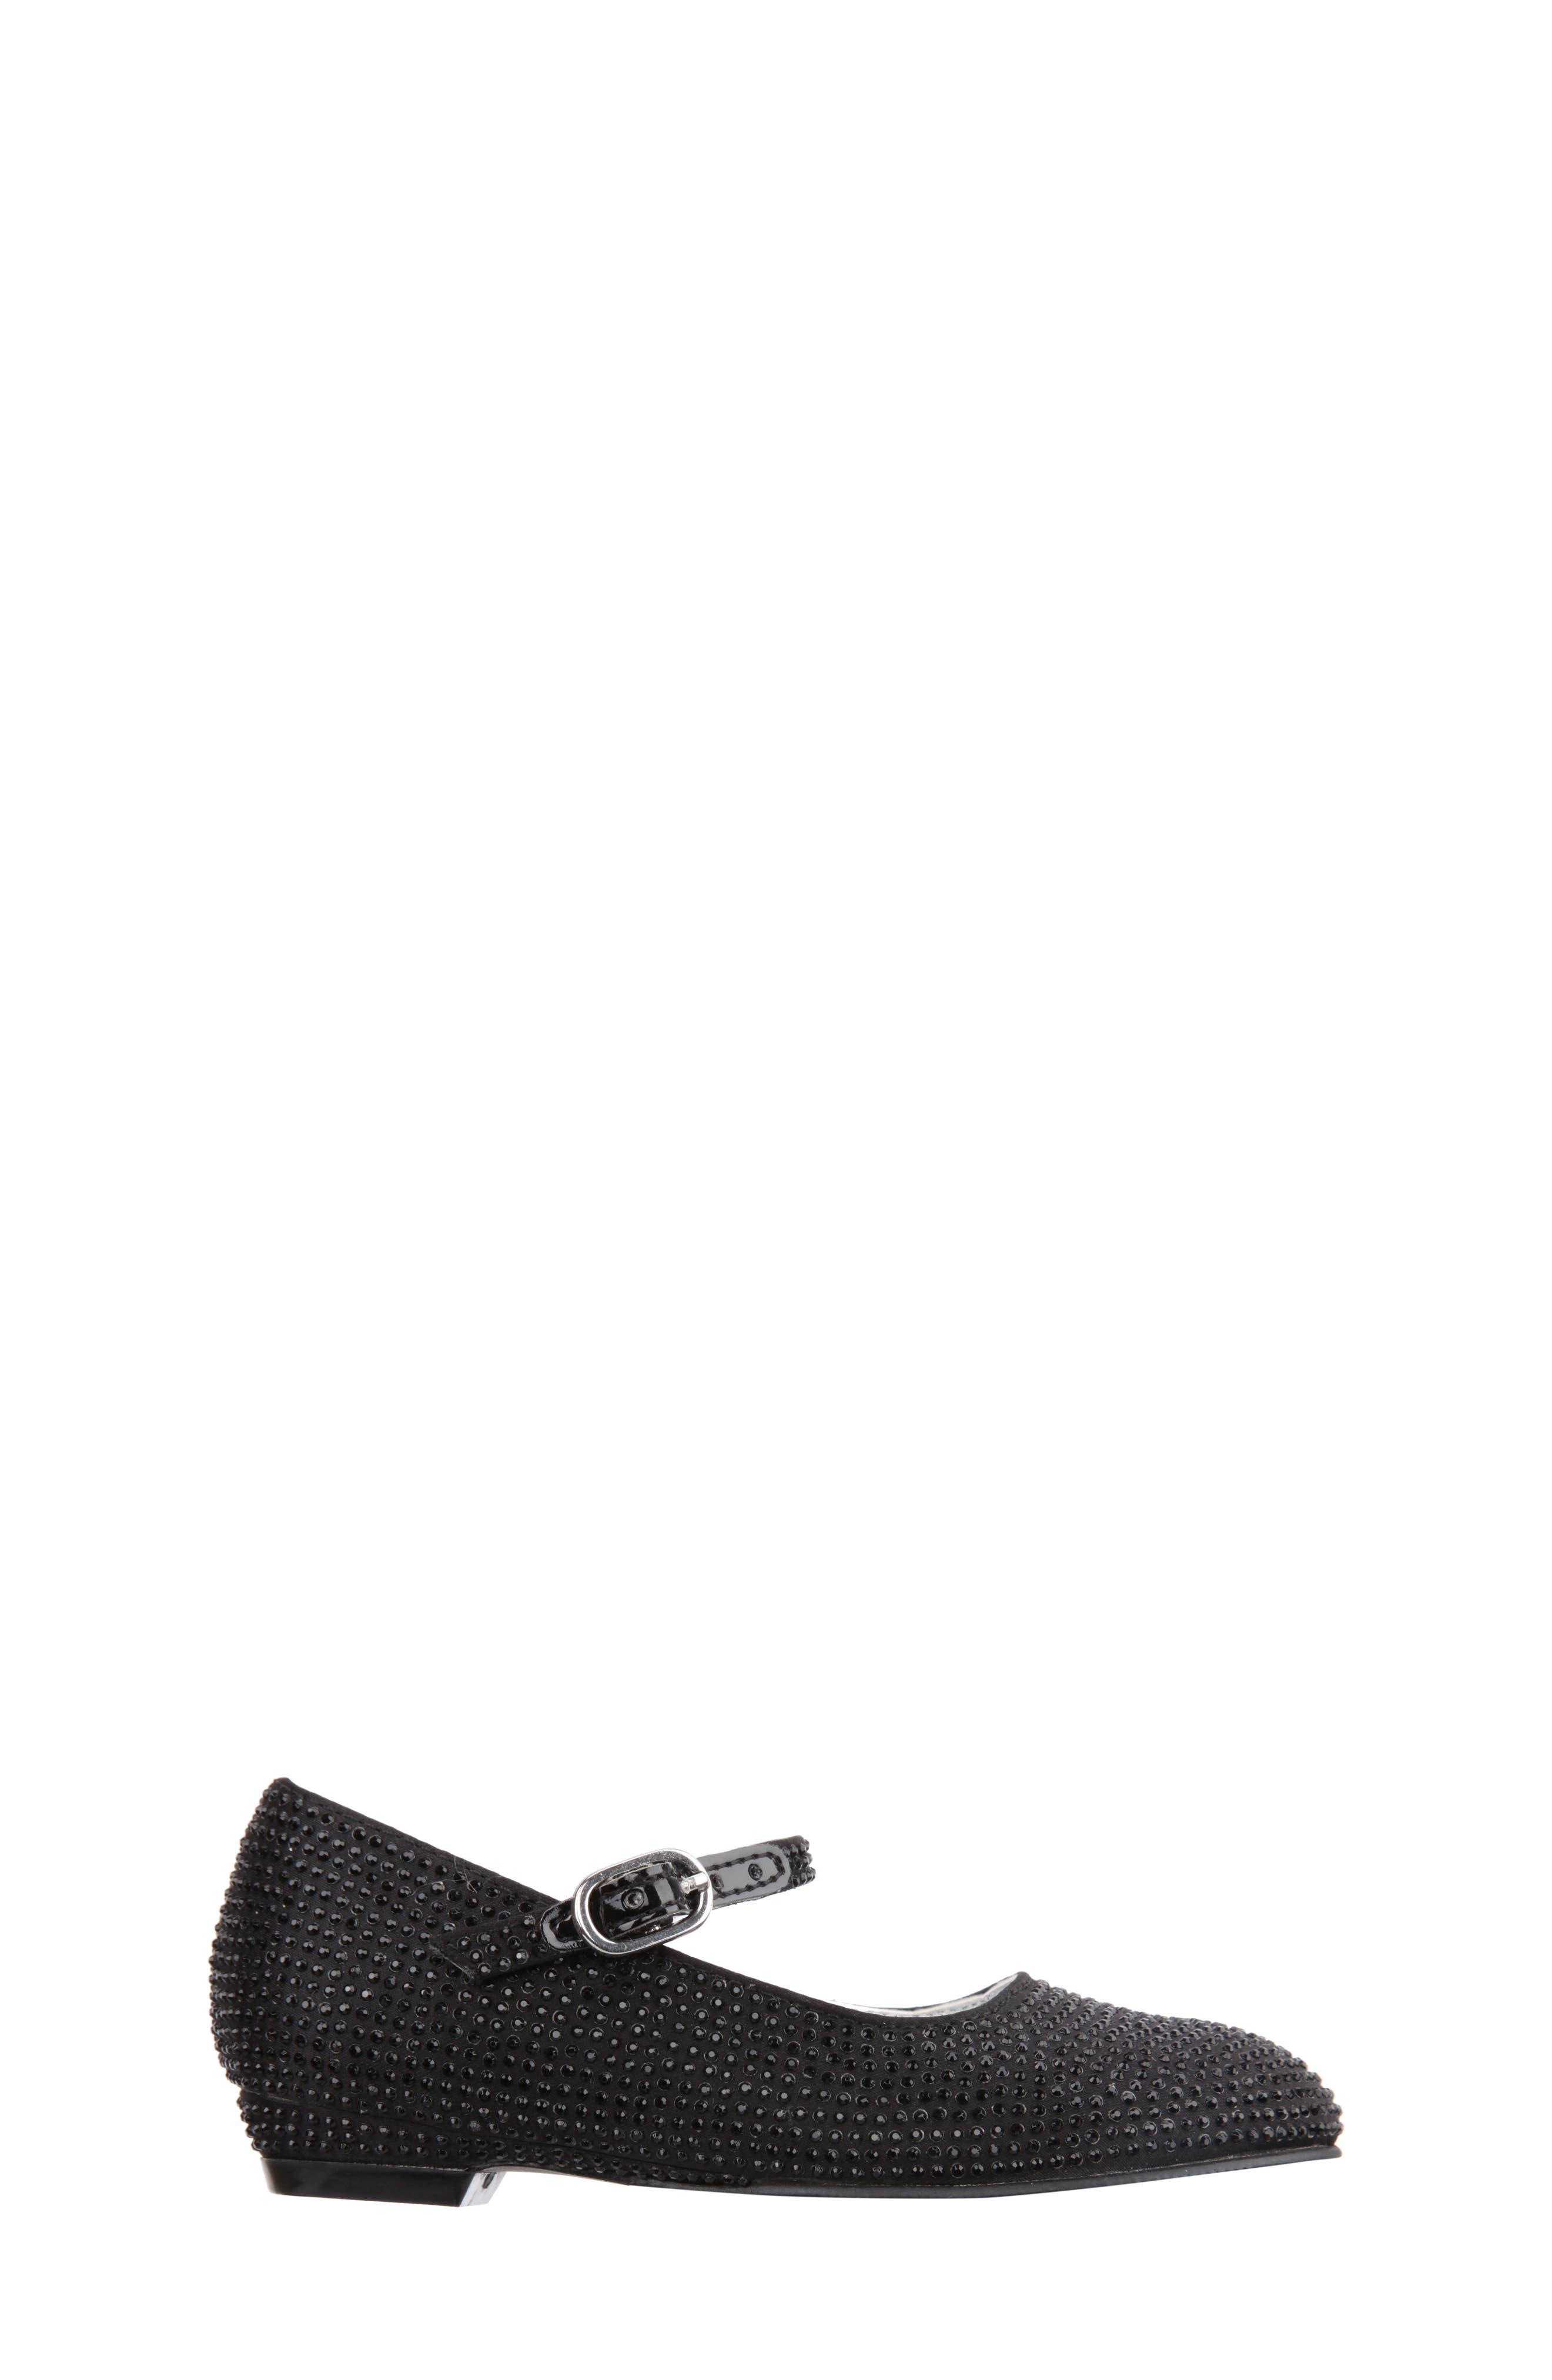 'Zelia' Mary Jane,                             Alternate thumbnail 3, color,                             Black Satin Stud